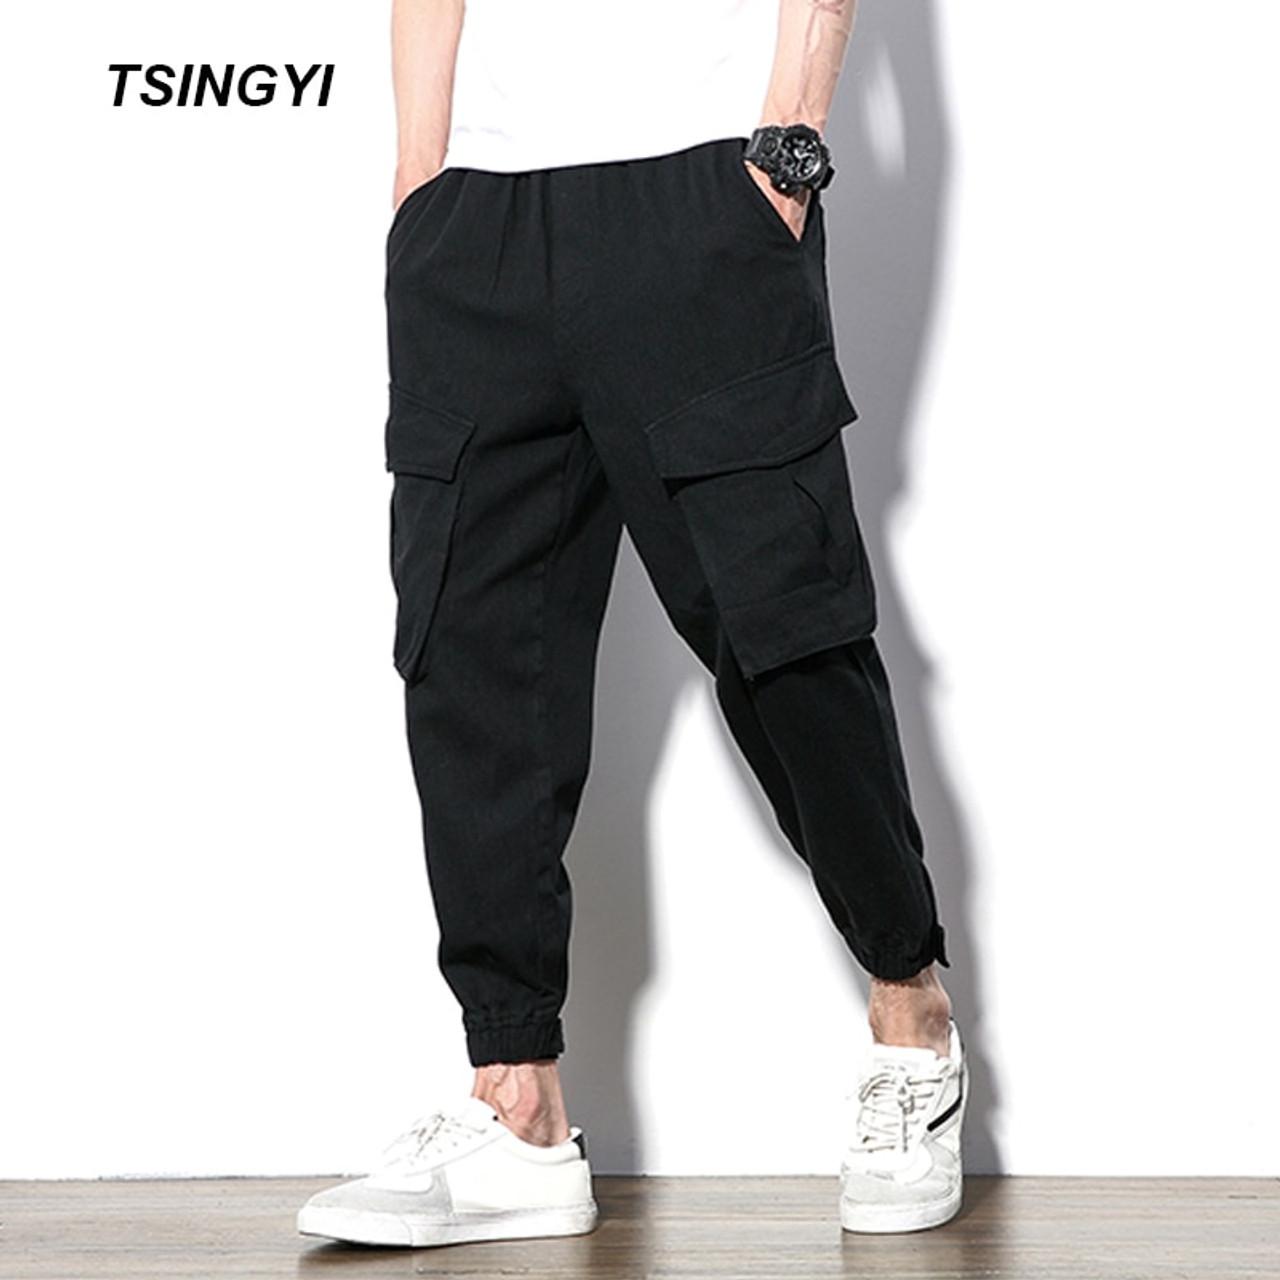 51387232699 Tsingyi Autumn Plus size Loose Man Joggers Casual Pants Black Camo Multi  Pockets Hip Hop Cargo ...